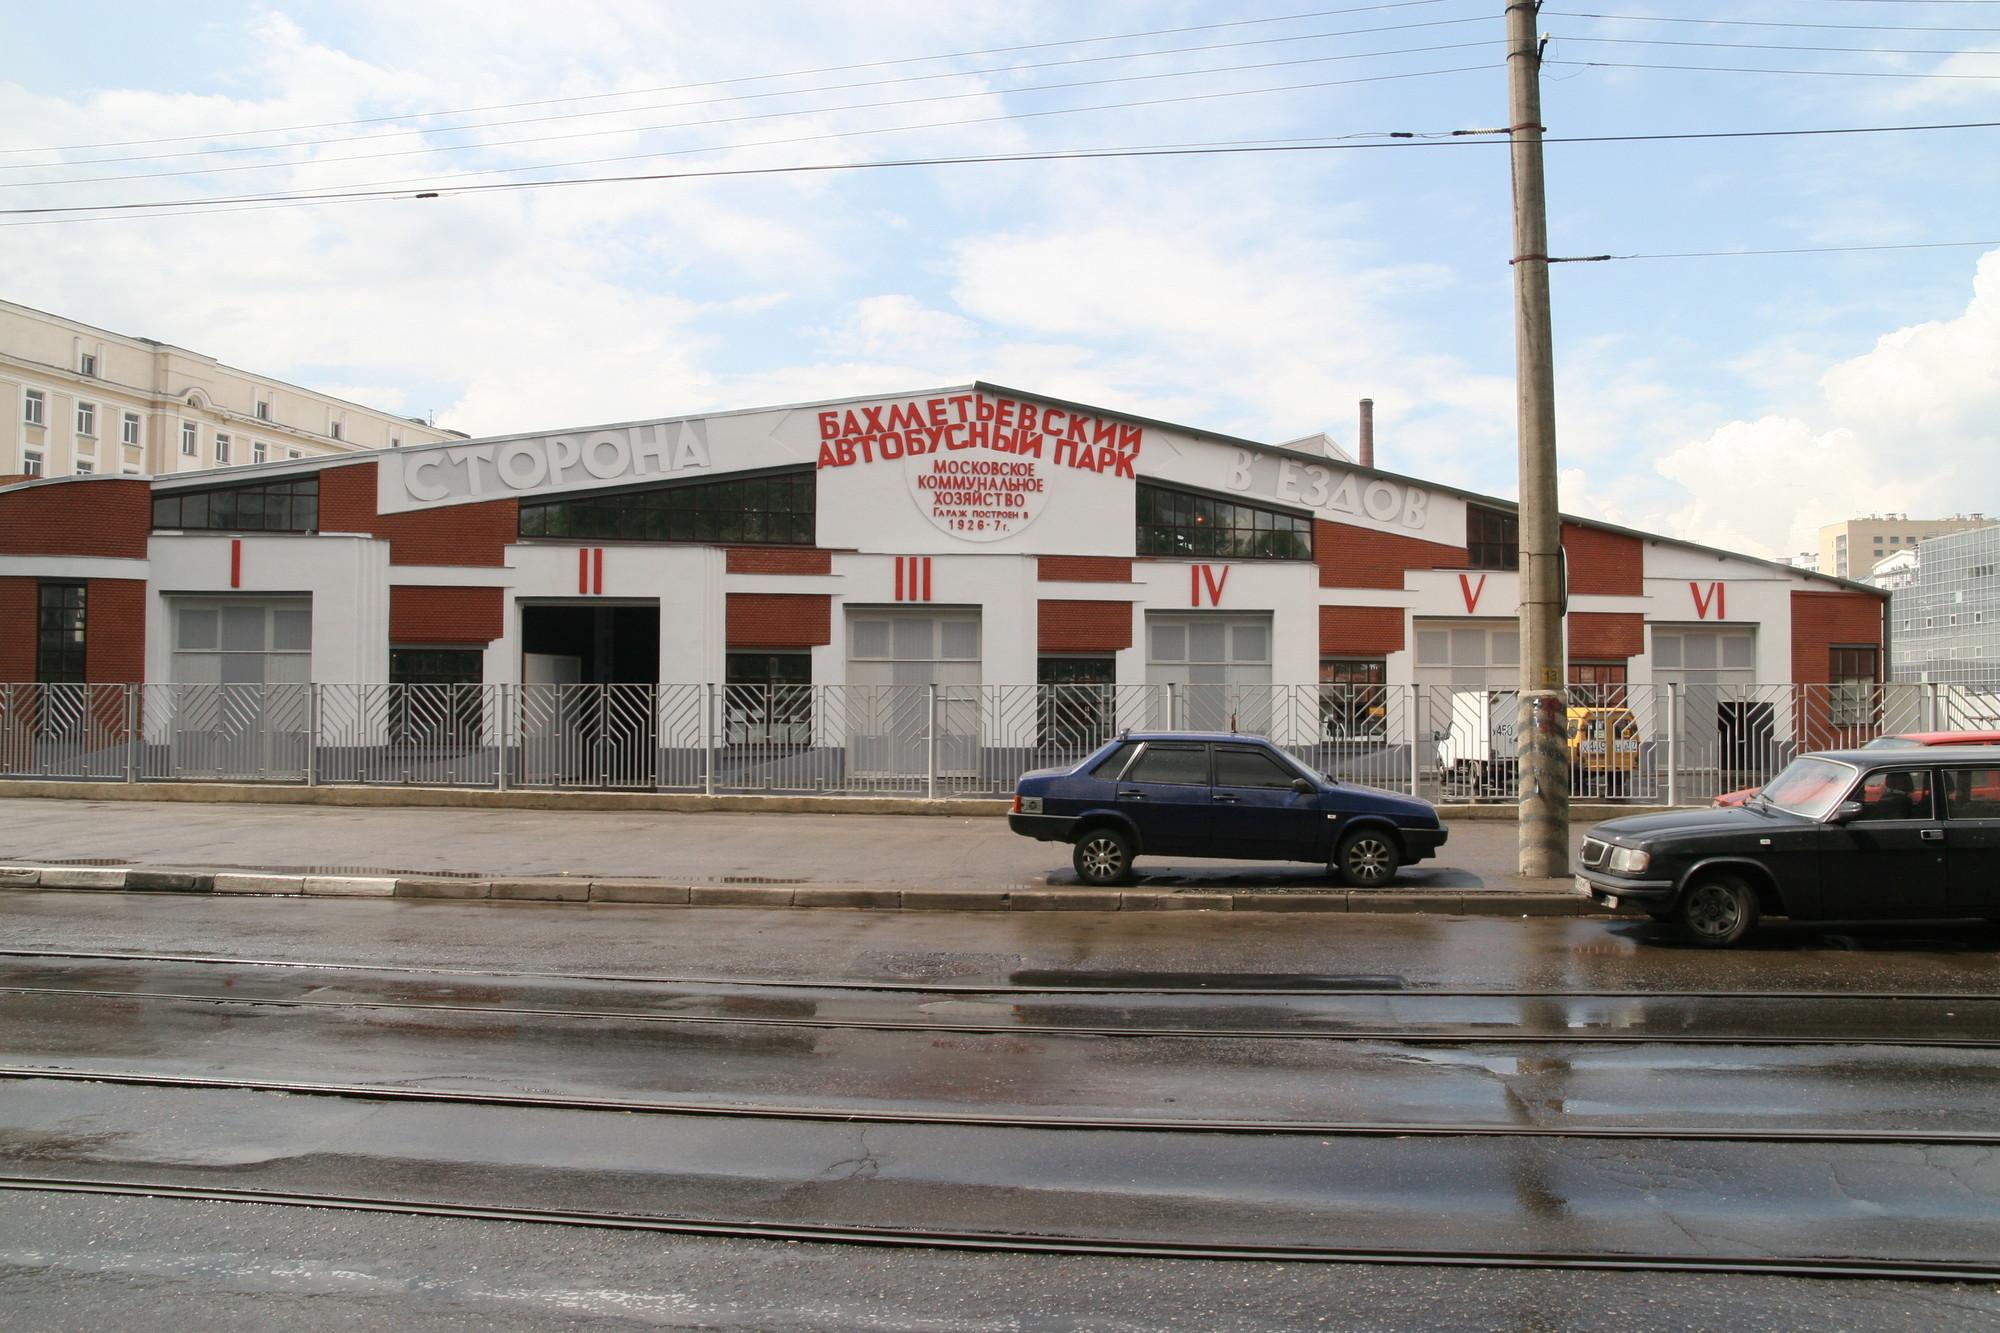 Bakhmetevsky Bus Garage via Wikimedia Commons